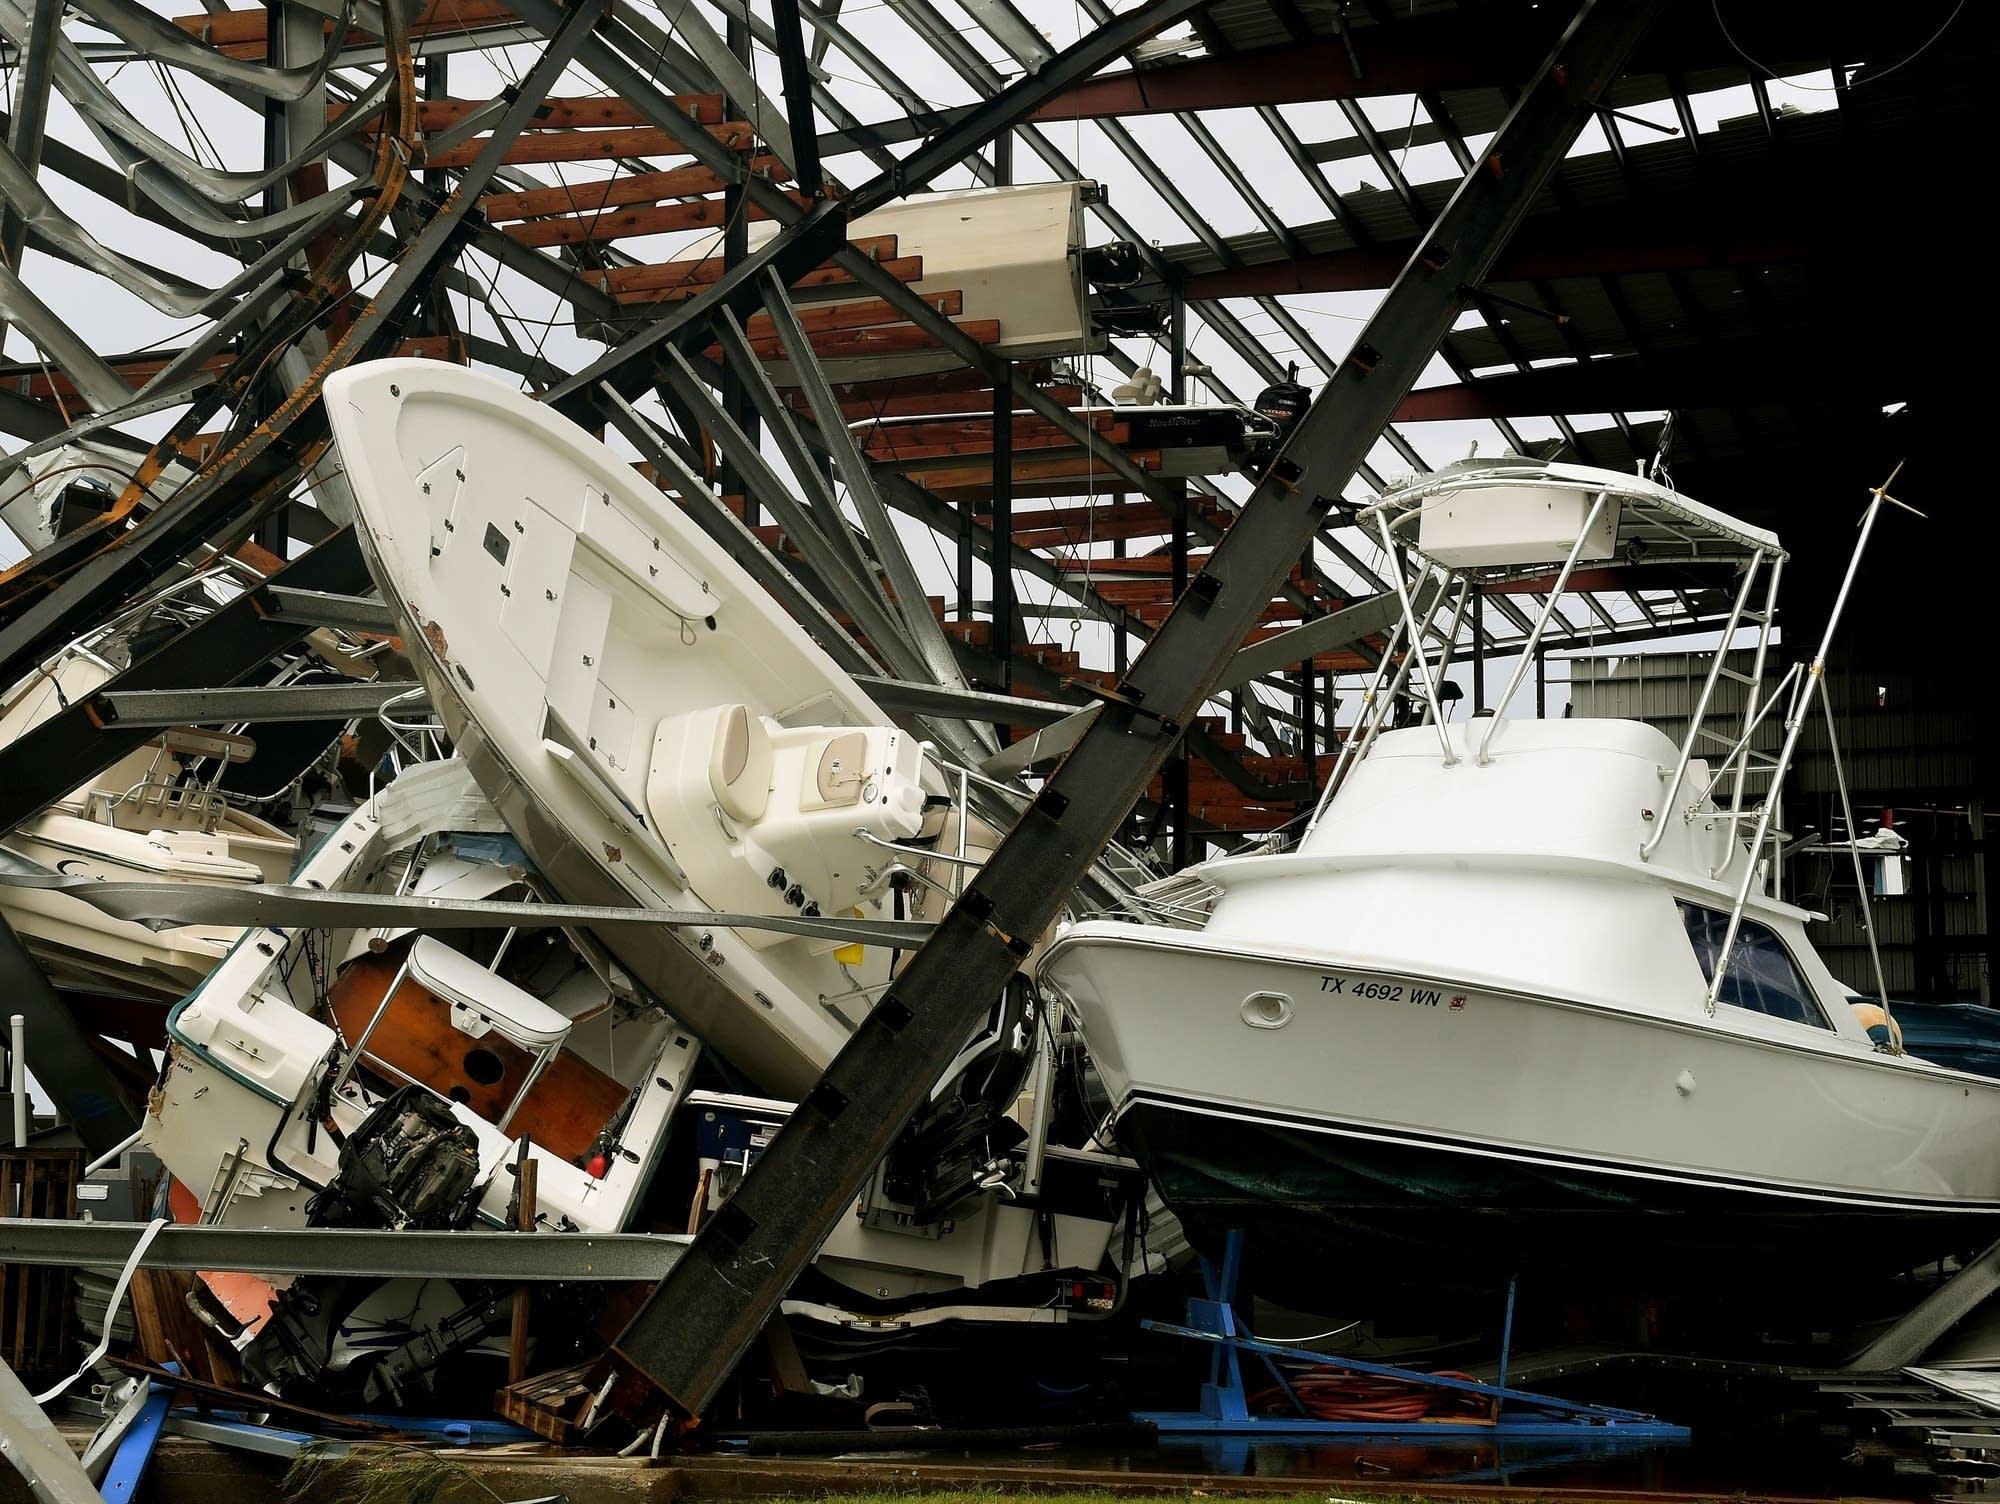 Damaged boats after Hurricane Harvey